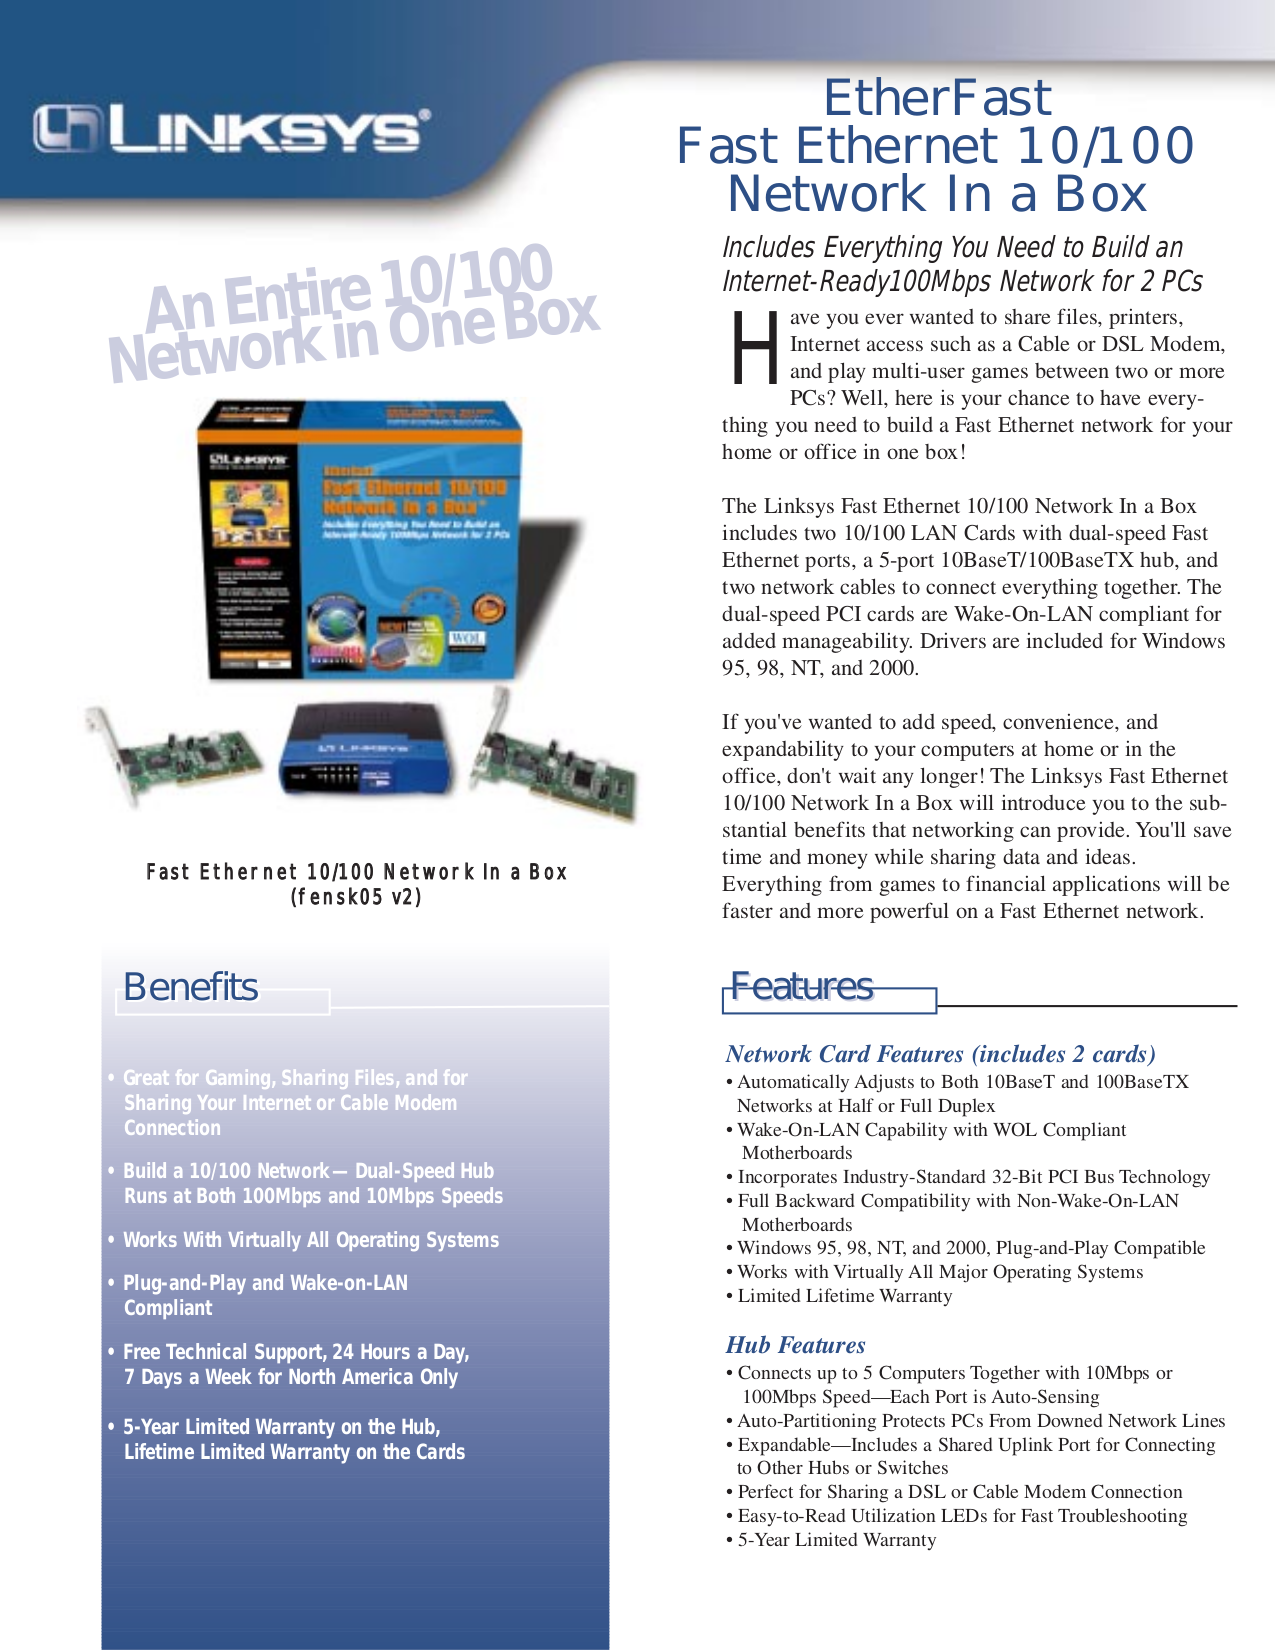 pdf for Linksys Switch FENSK05 manual